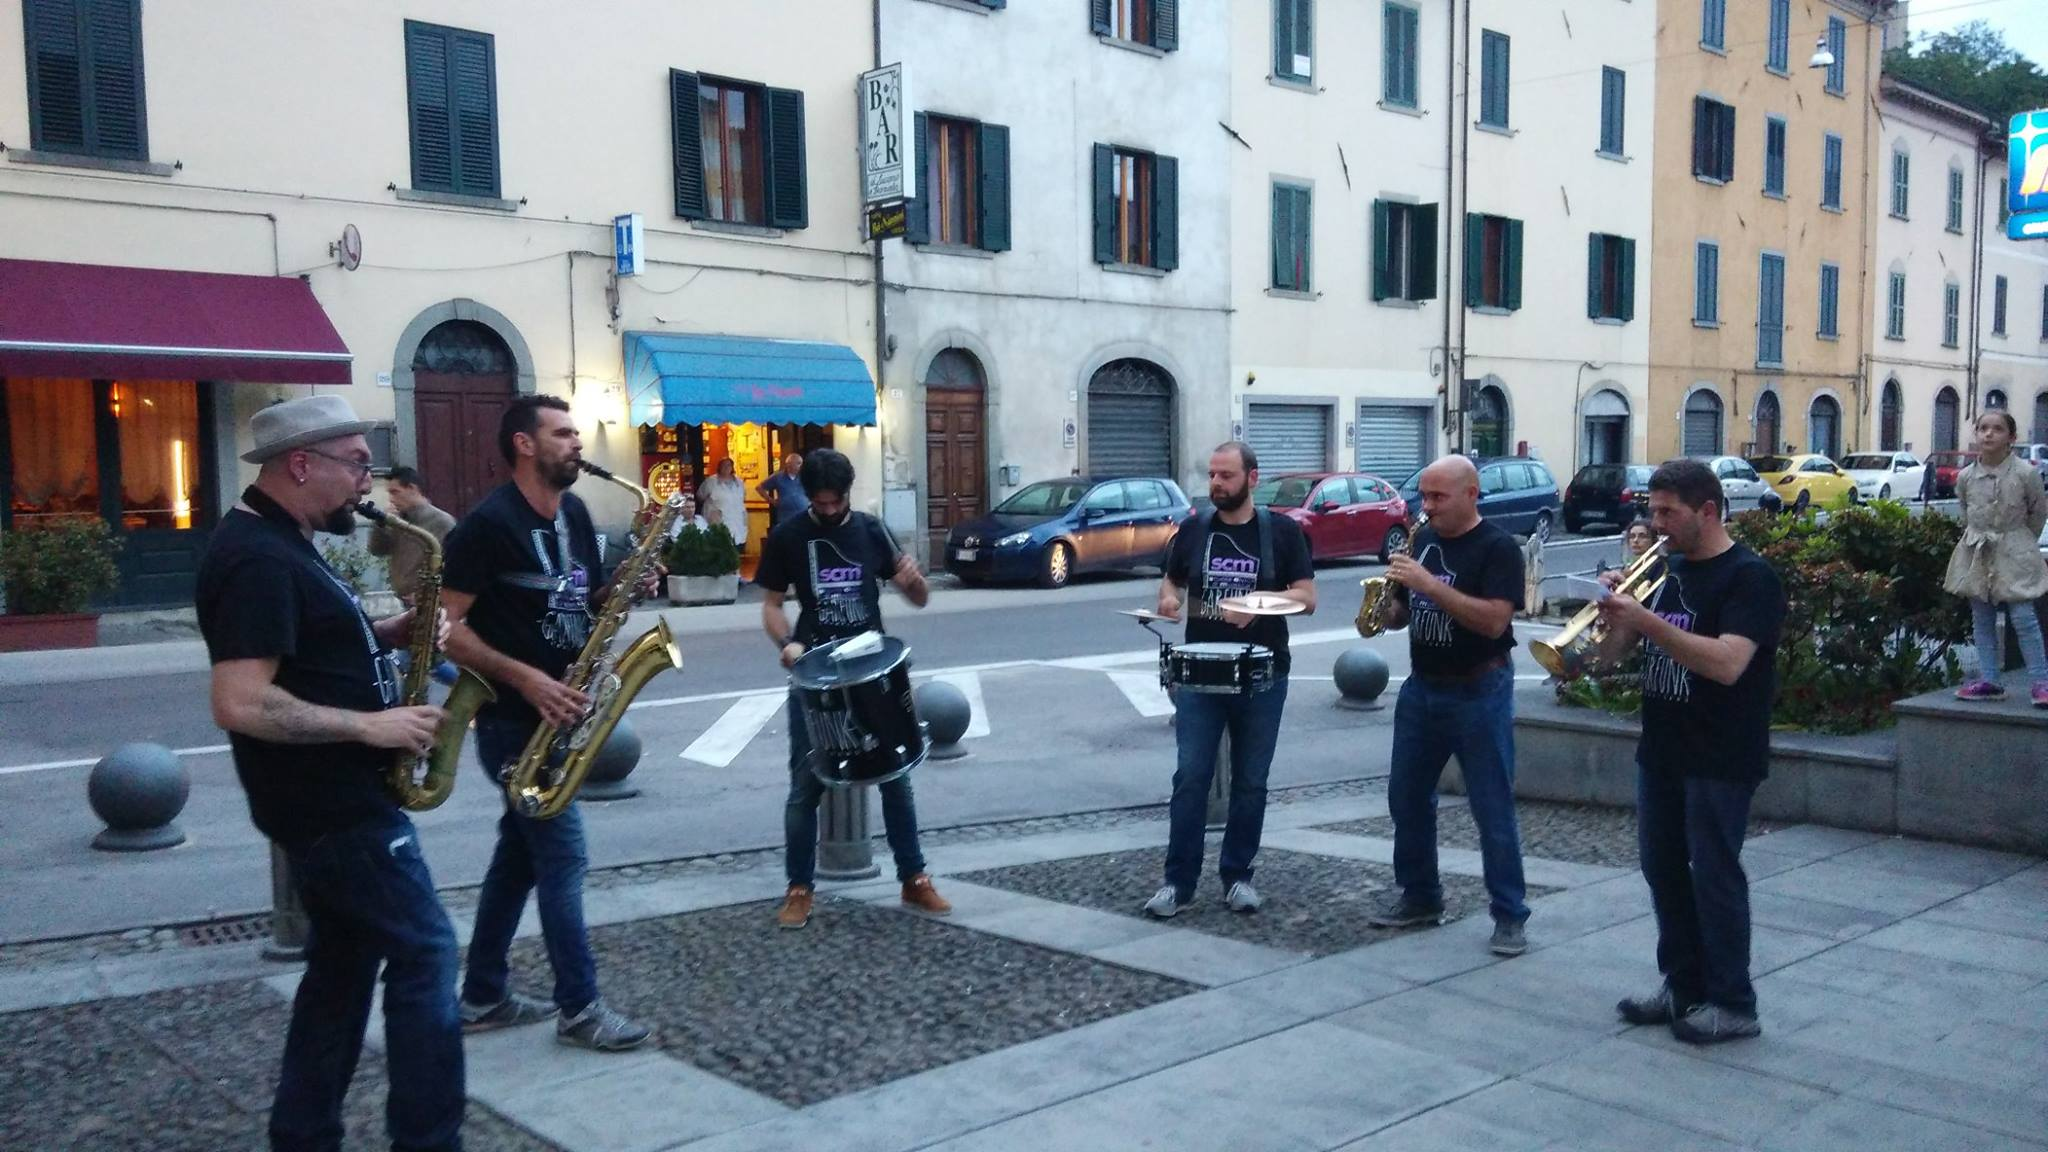 Garfunk Street Band